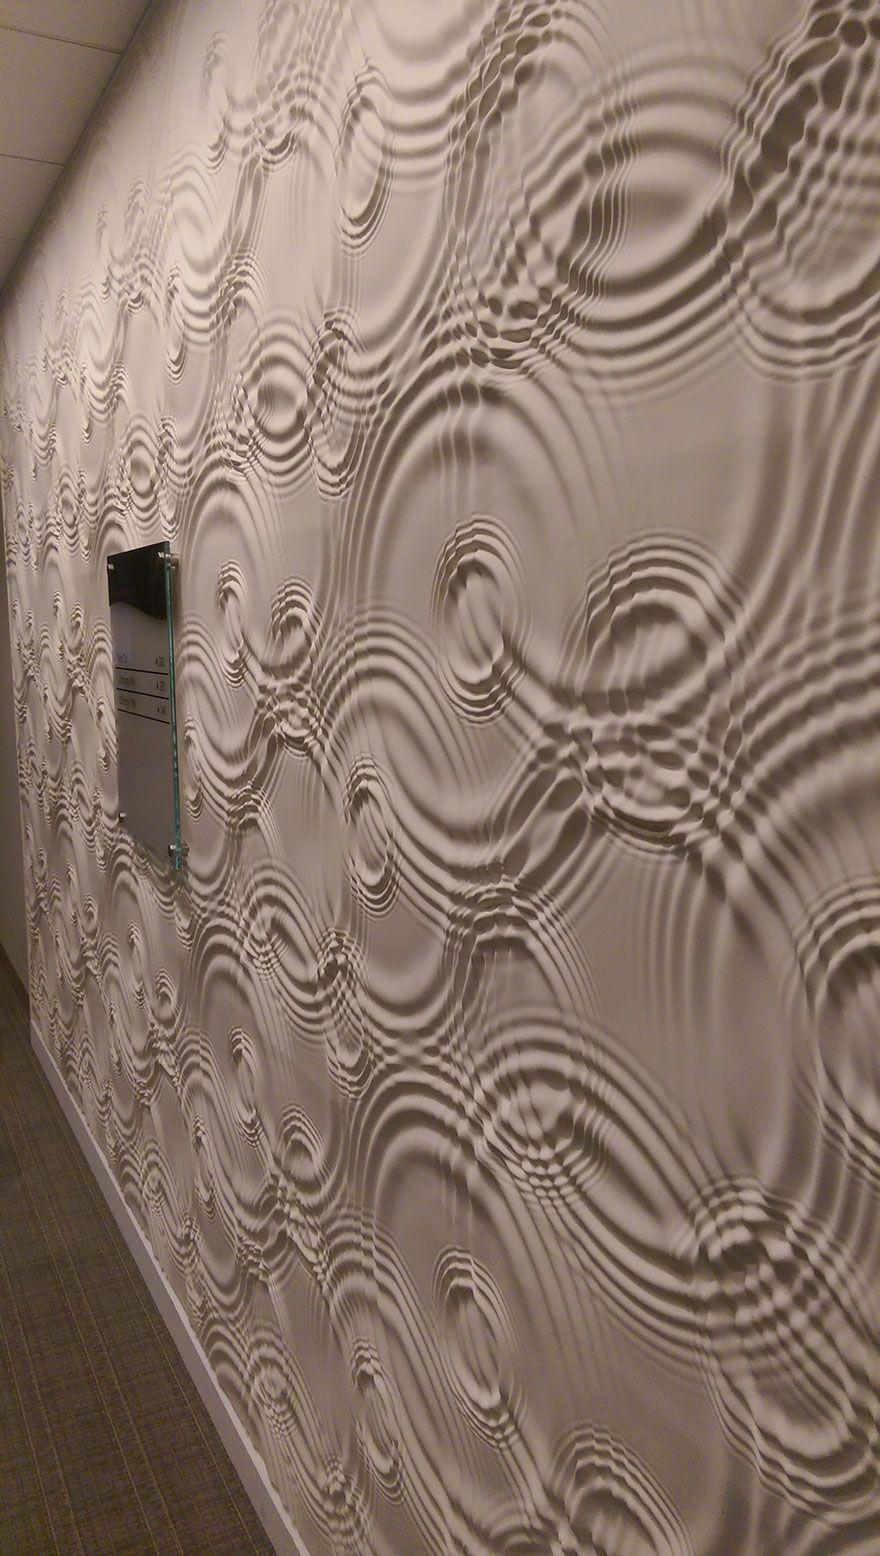 50 Stunning Interior Design Ideas That Will Take Your House To Another Level: 40+ Stunning Interior Design Ideas That Will Take Your House To Another Level